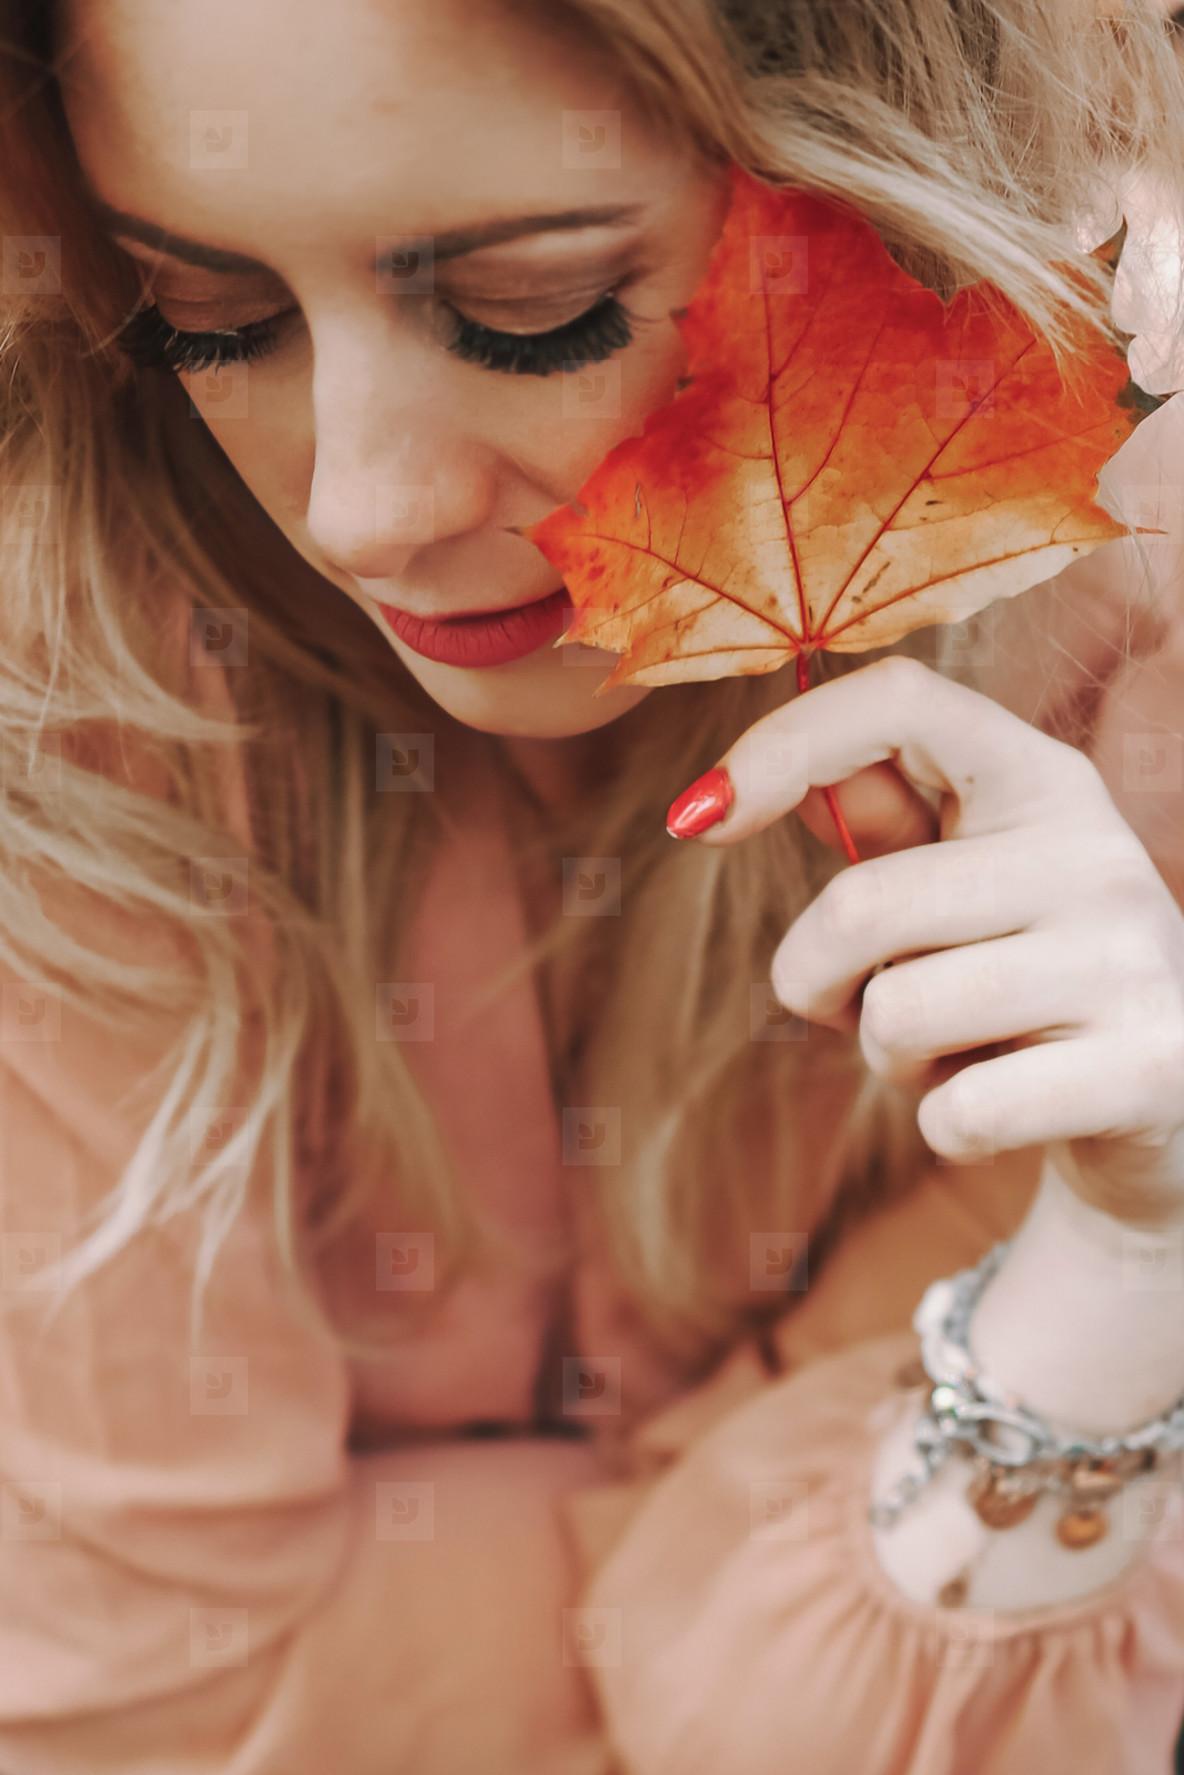 Beautiful girl during fall  6